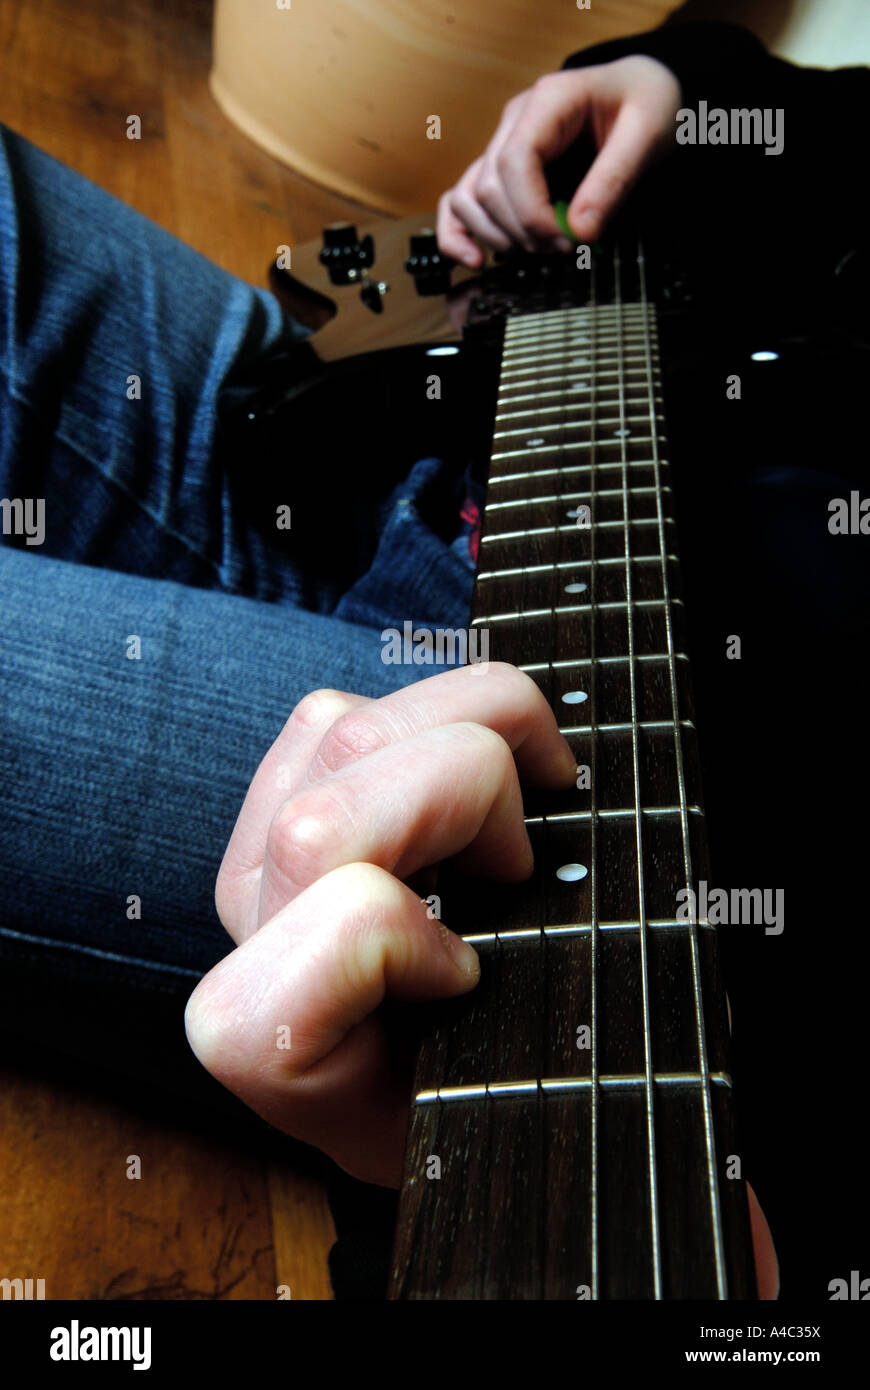 Teenager Playing Guitar. - Stock Image